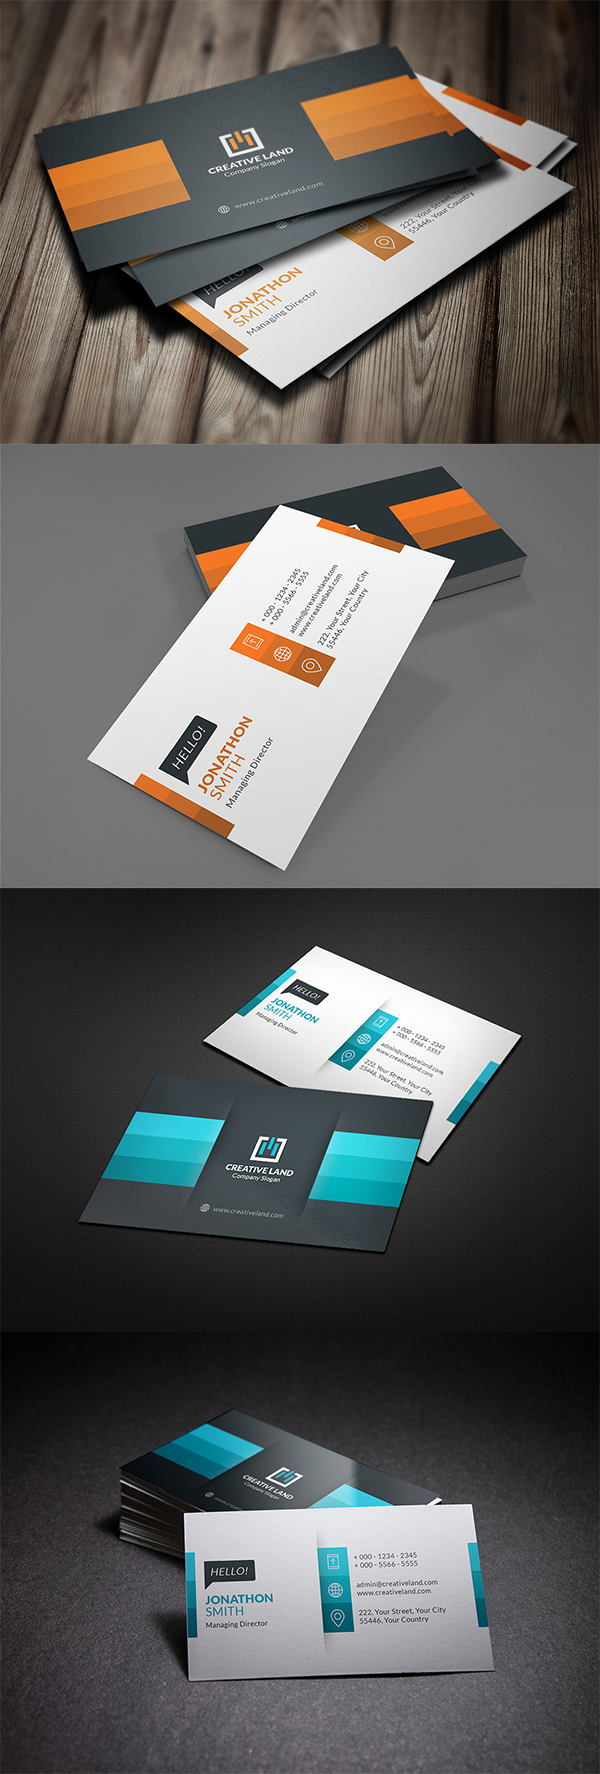 10 Business Card Design